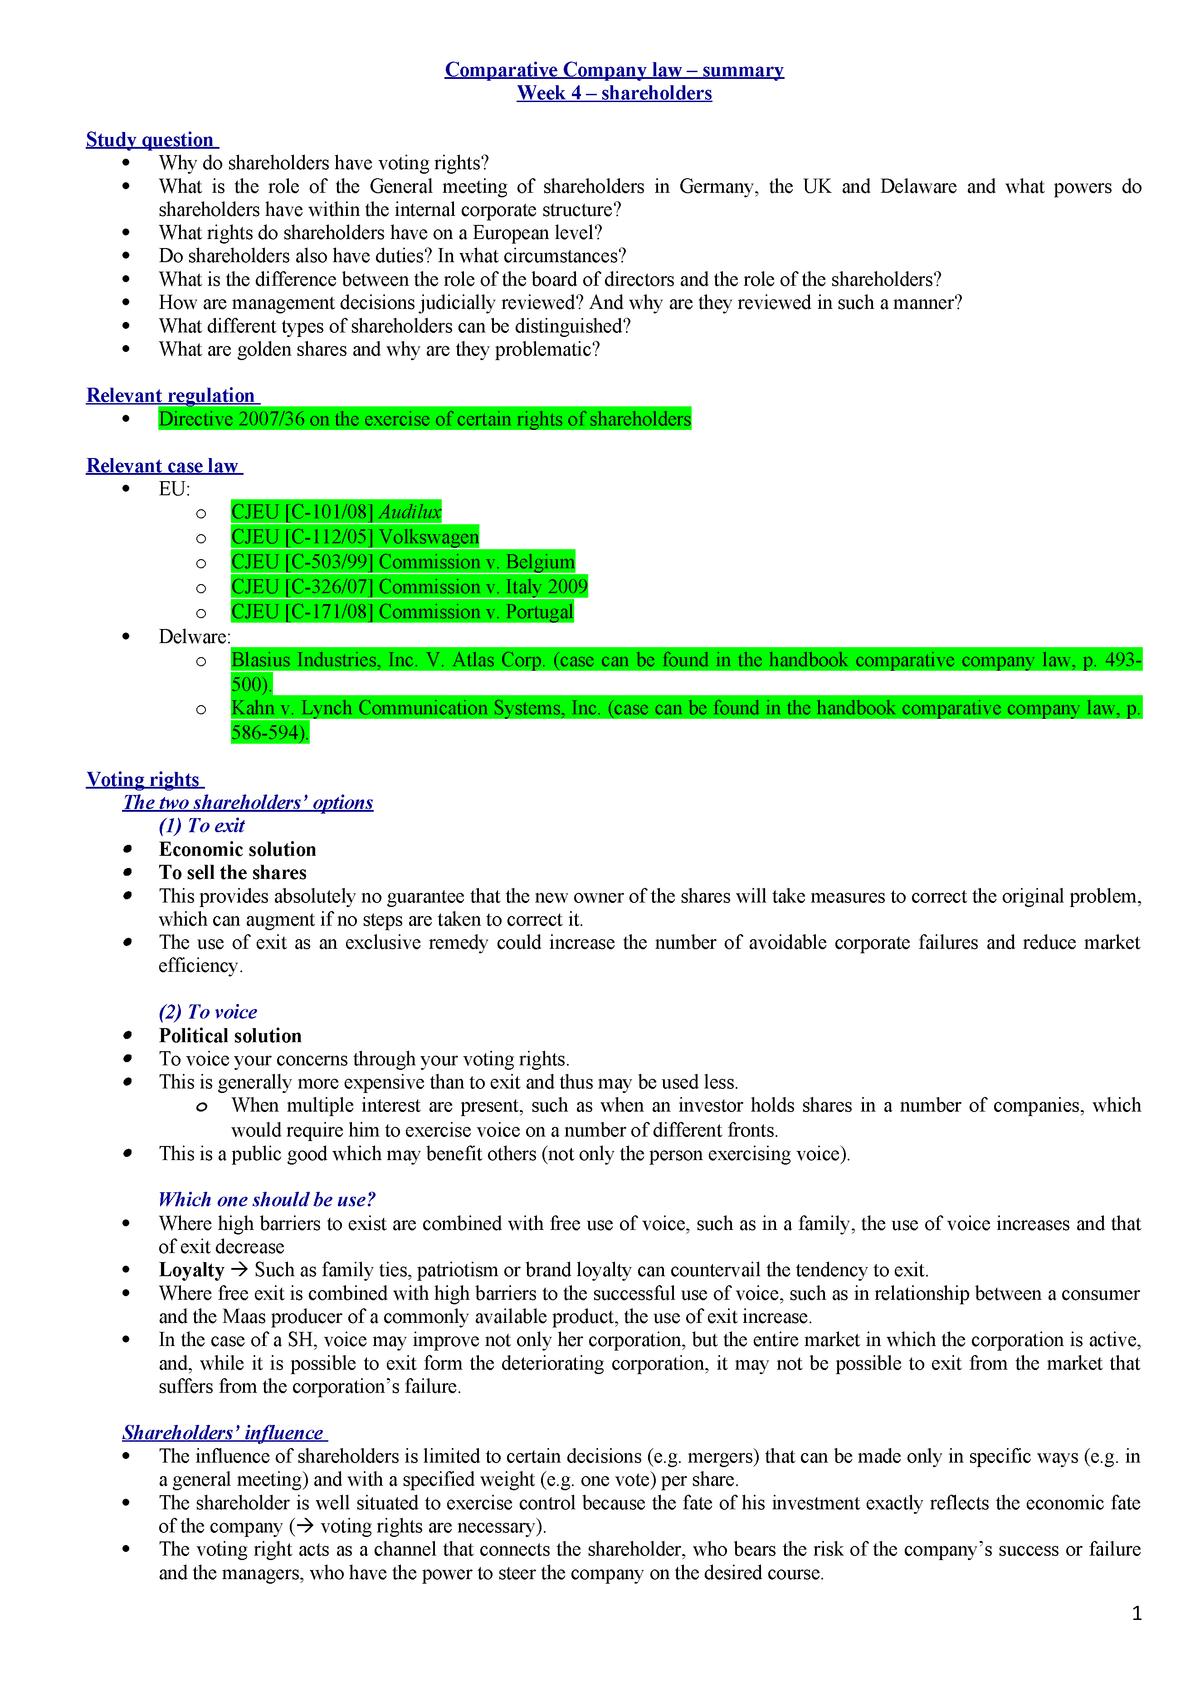 Week 4 - Company law Ï© o╠é summary - PRI4004 - StudeerSnel